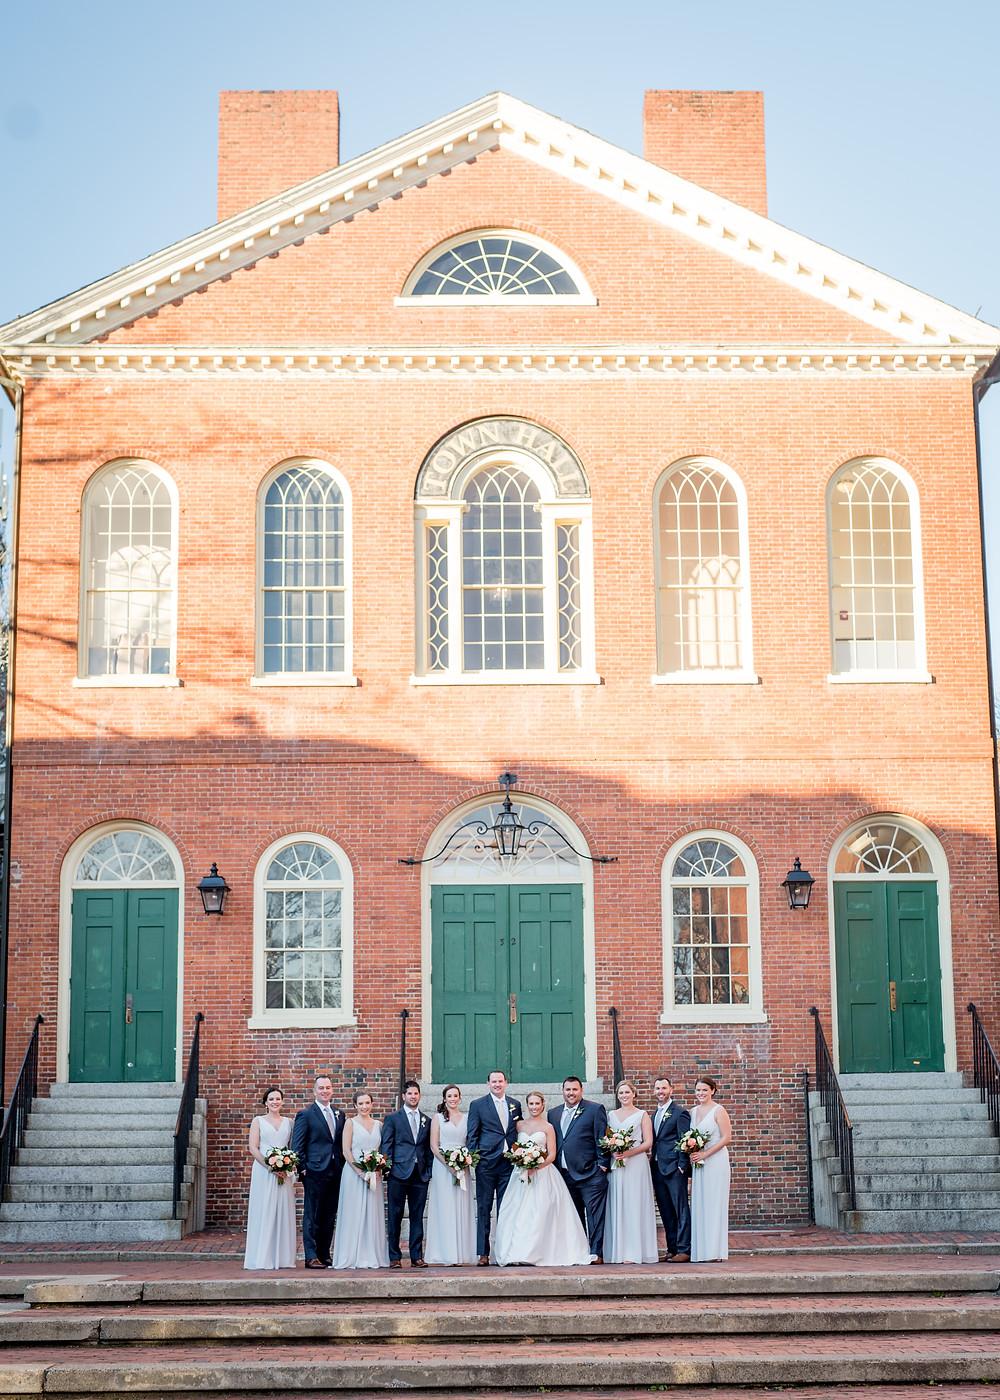 Old Town Hall, Salem MA wedding, Free Bird Photography, Fleur + Stitch, Fleur and Stitch Wedding Flowers